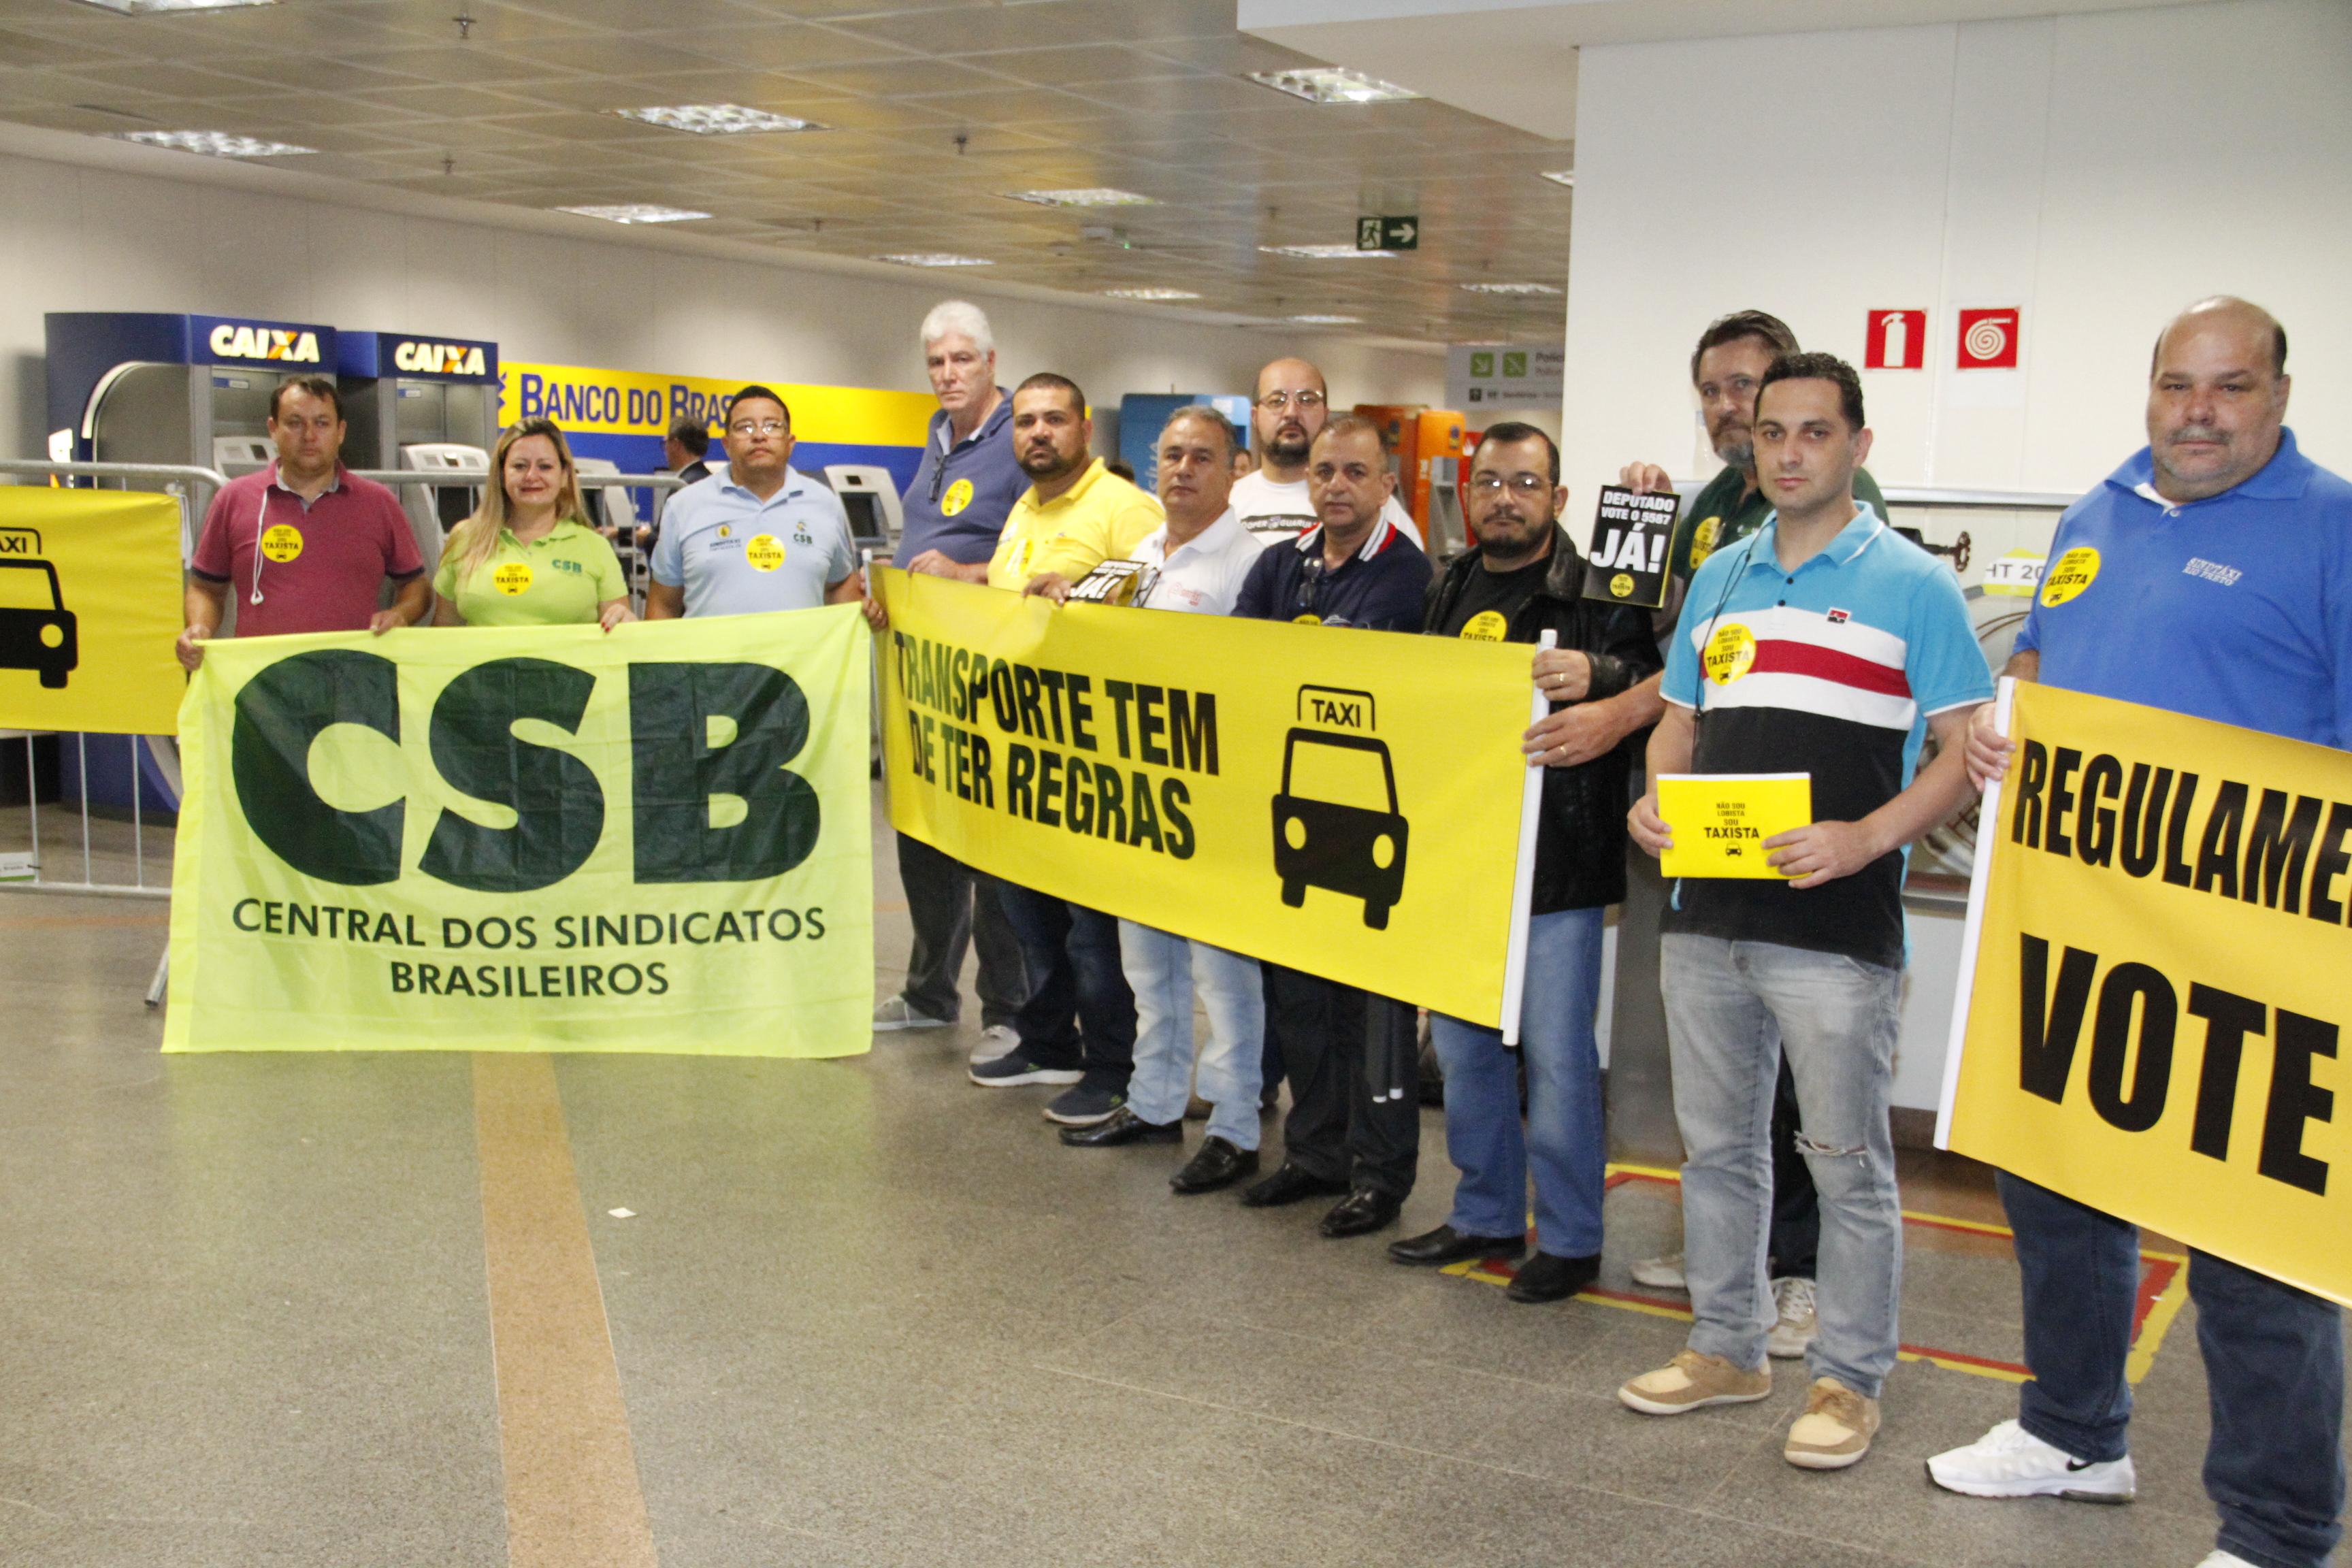 Pelo transporte seguro, taxistas pedem apoio de deputados no Aeroporto de Brasília